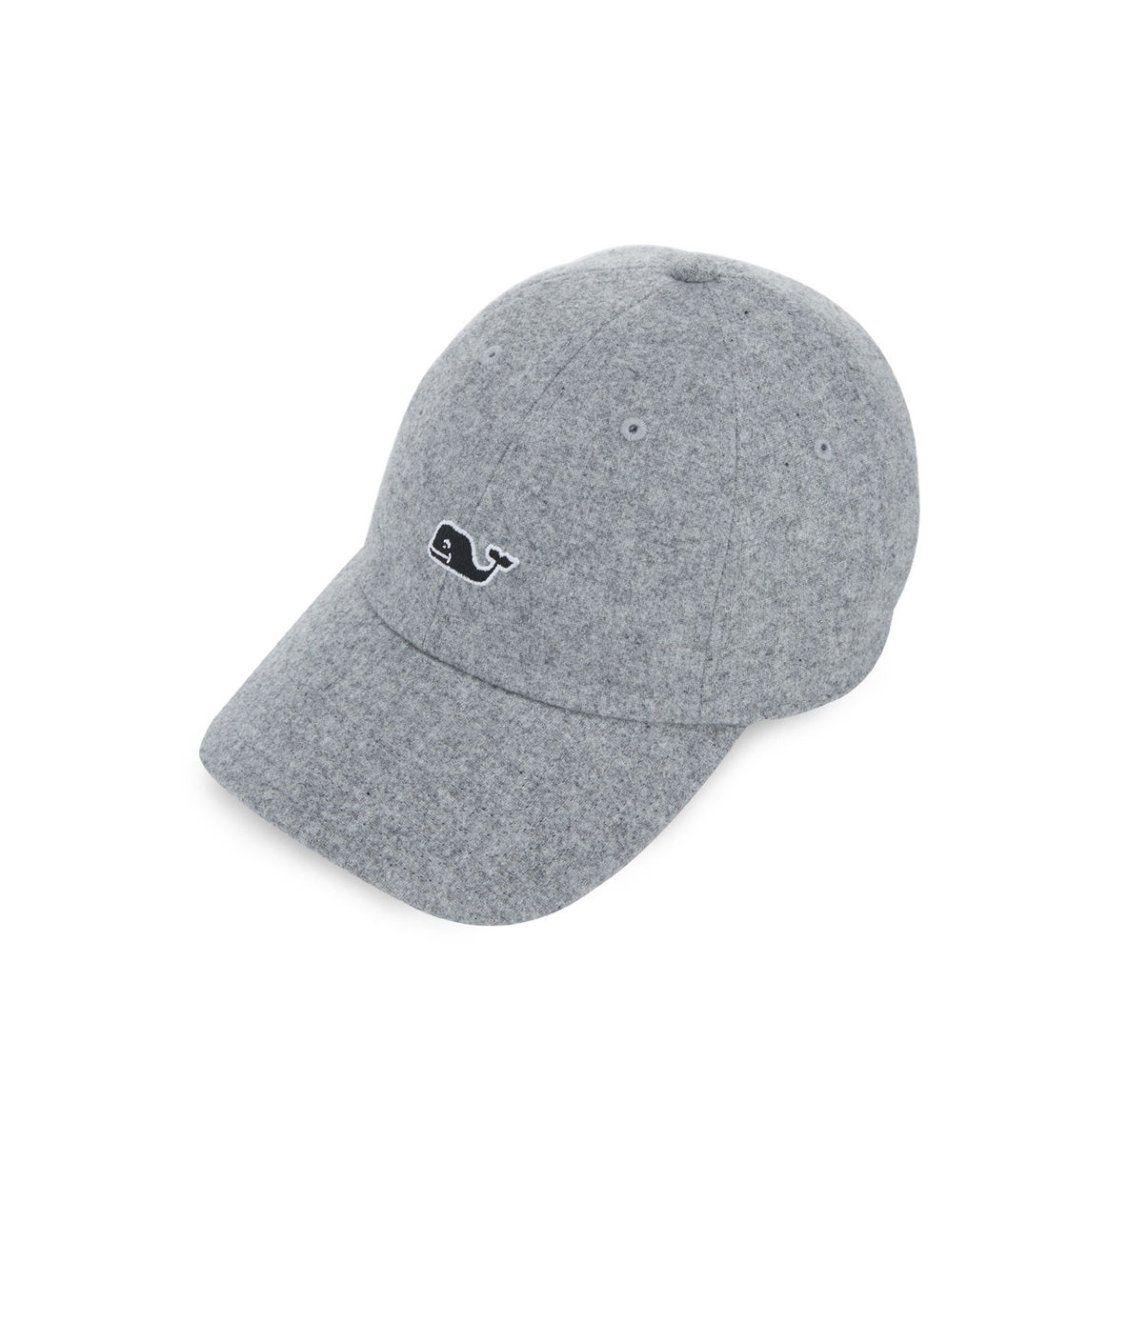 Wool Whale Logo Baseball Hat  6760dfb6d950